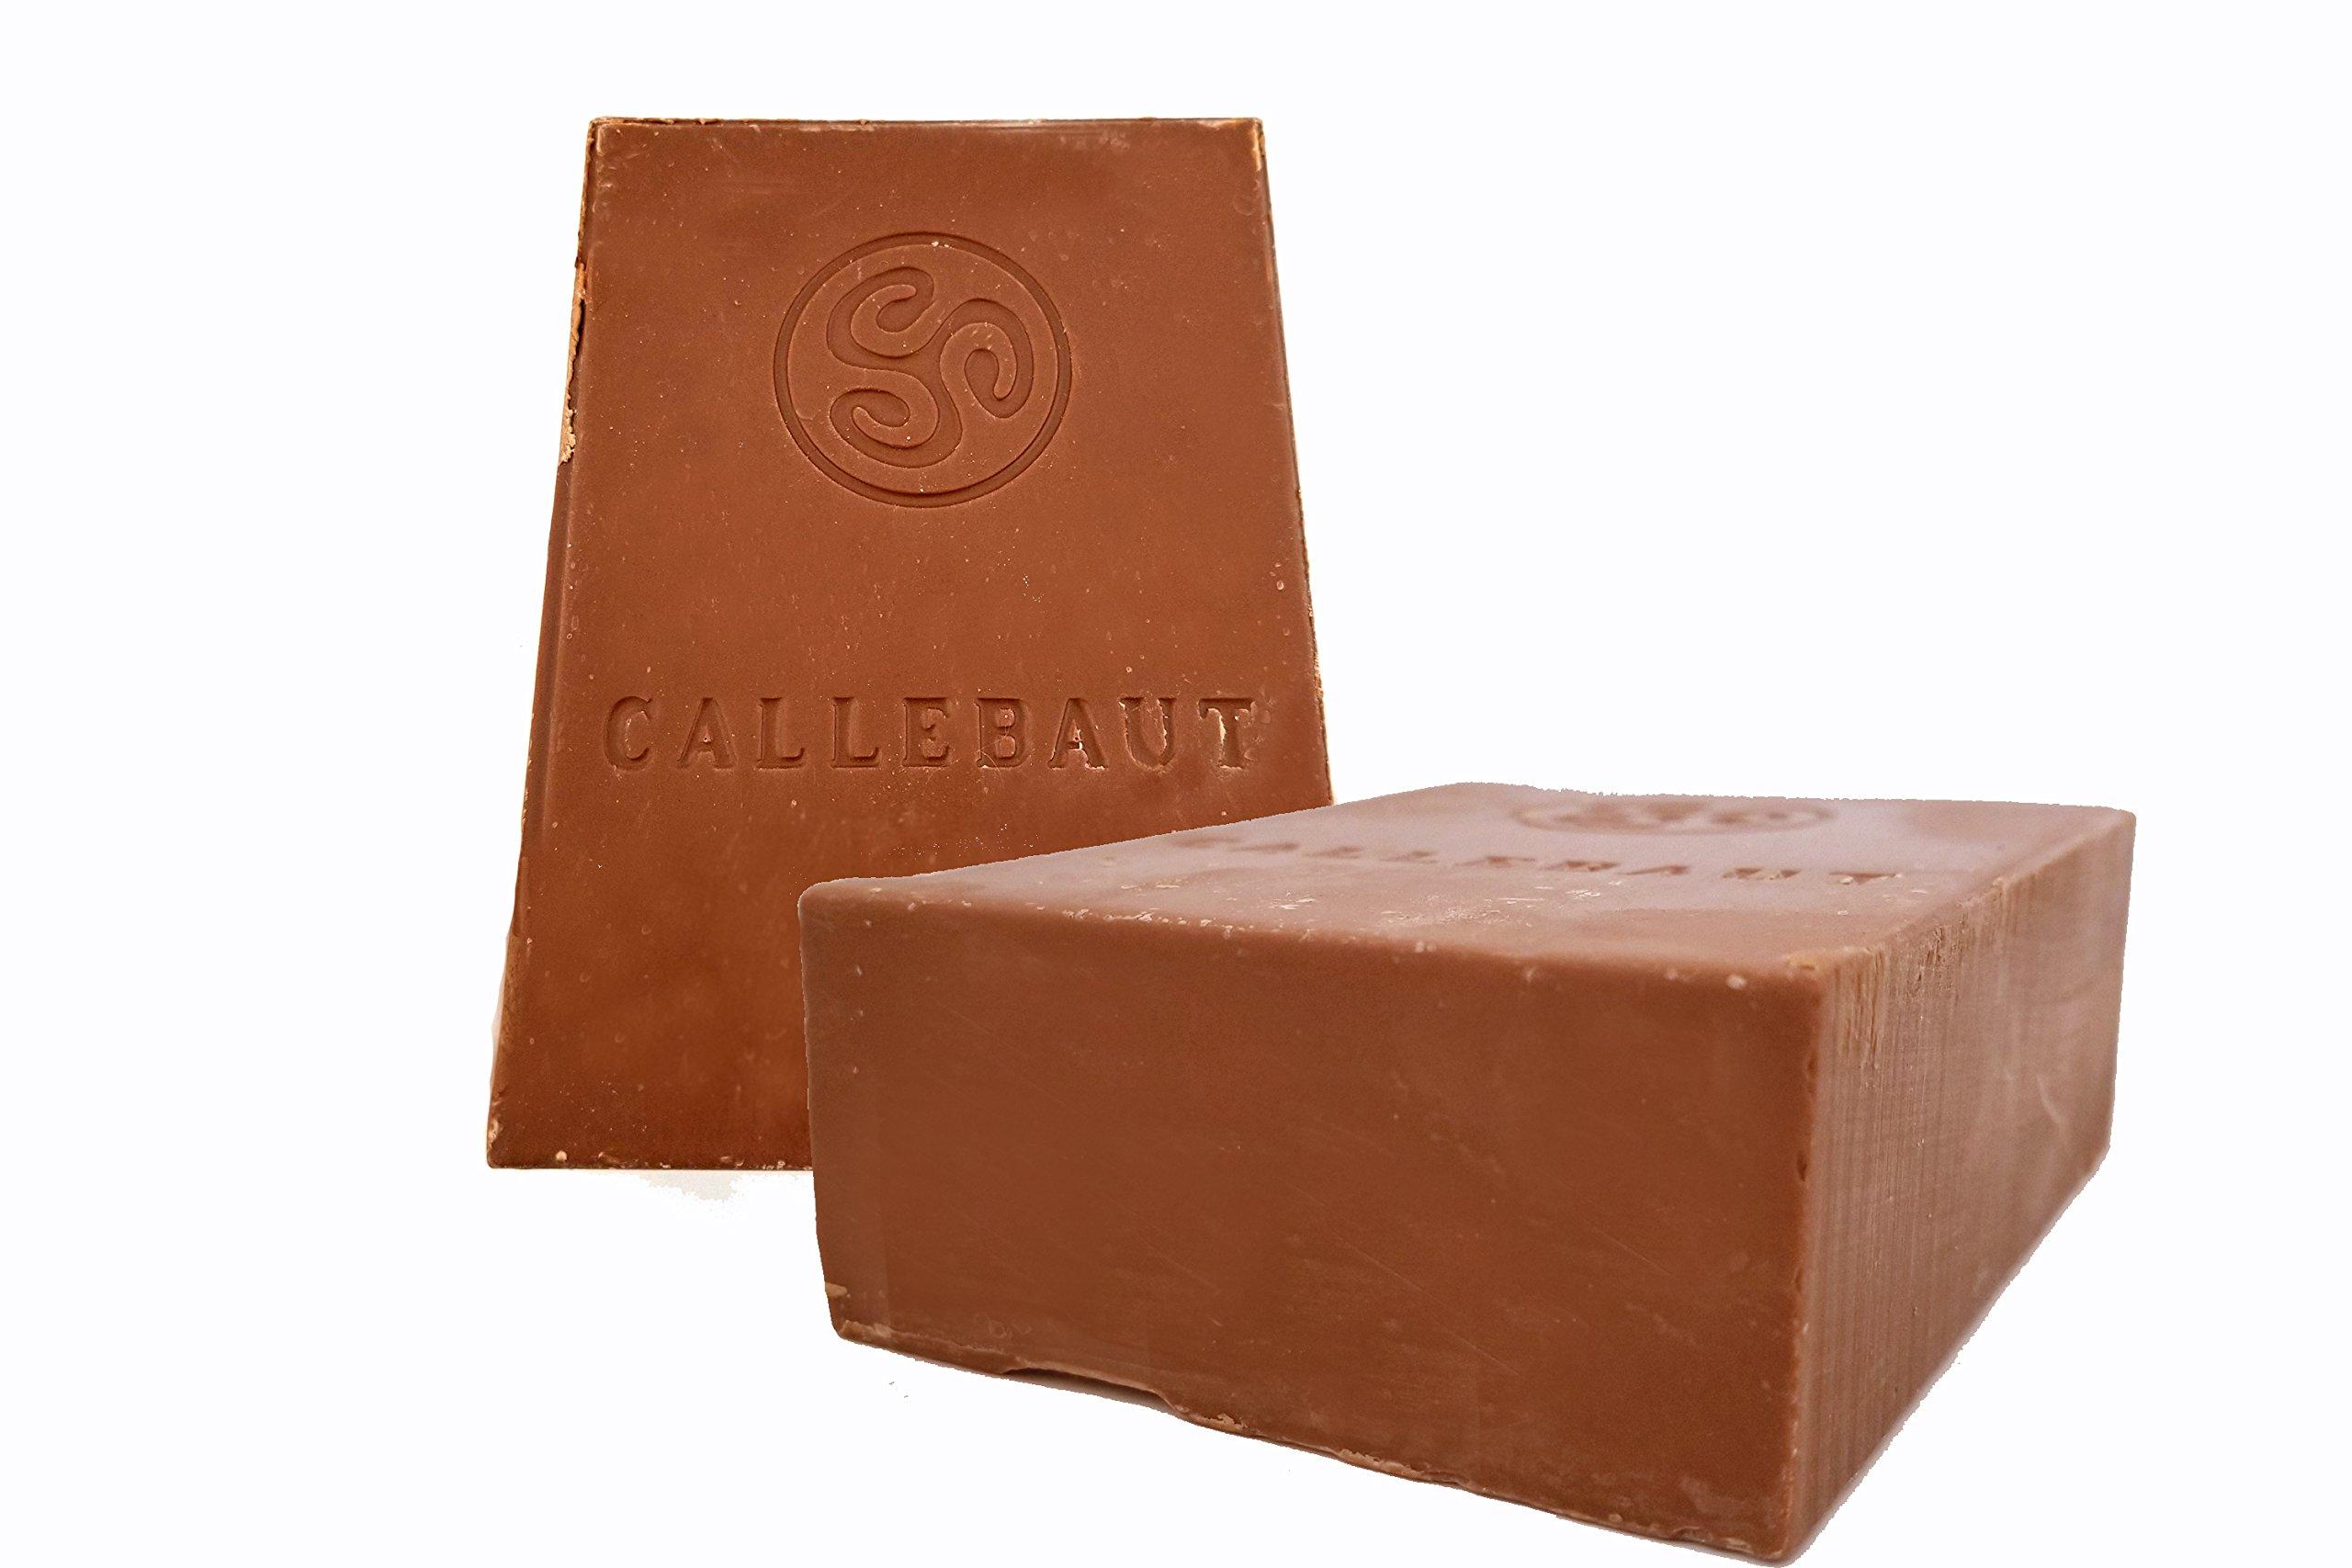 Callebaut Finest Belgian Milk Chocolate Blocks - Approximately 1 pound per Block